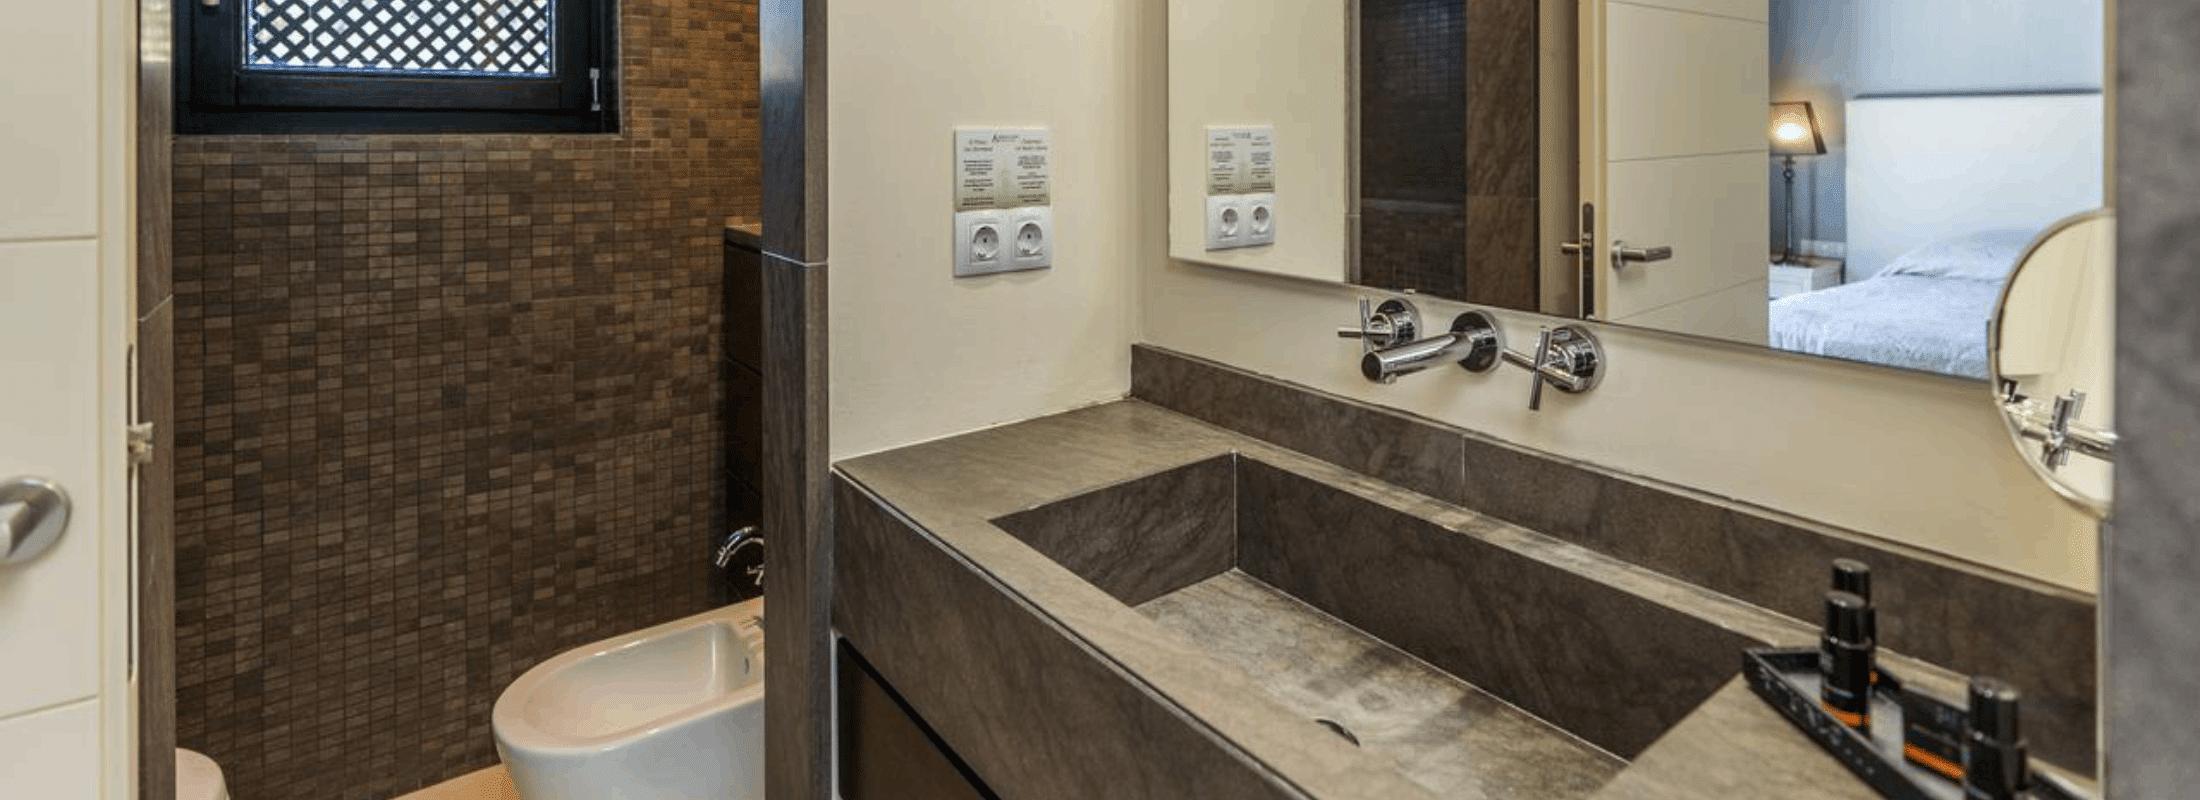 interior baño